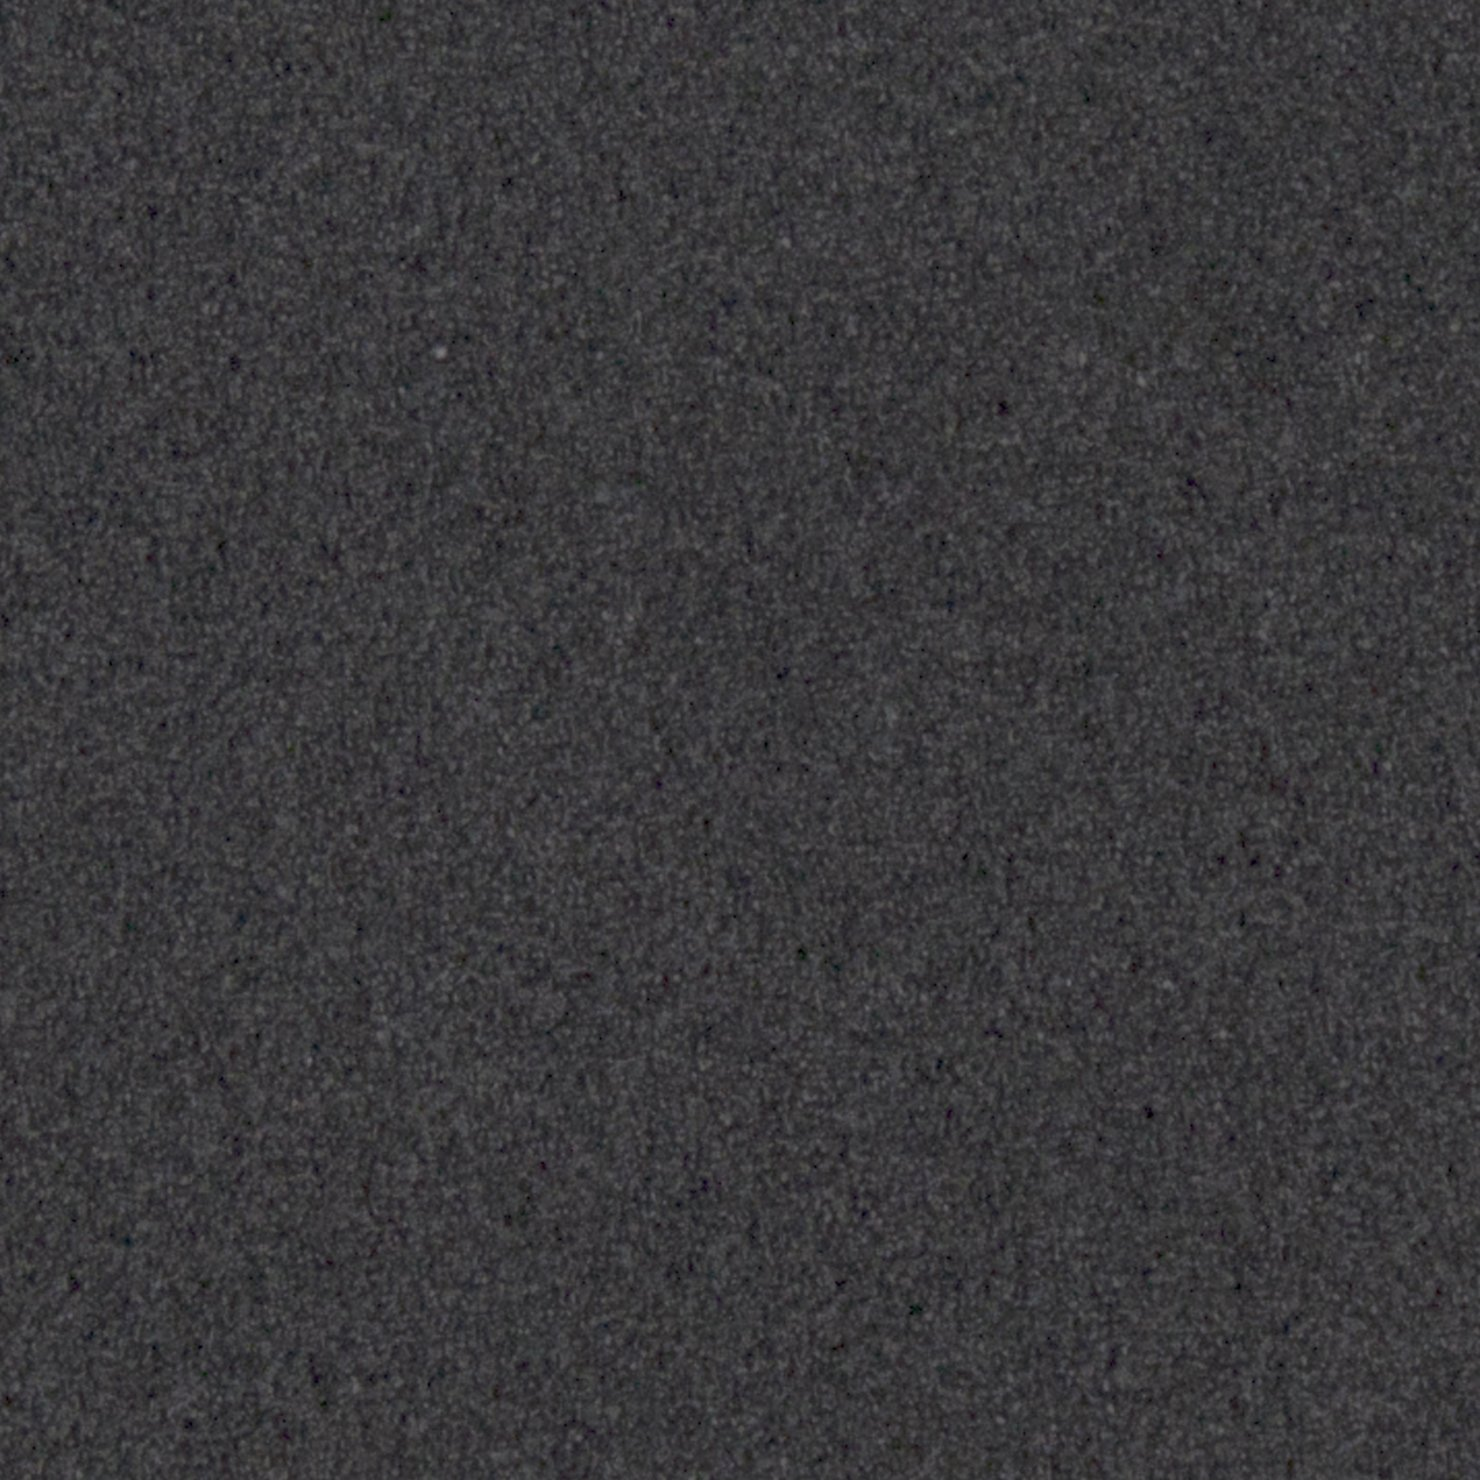 Bostik QuartzLock2 Grout 499 Jet Black 9 lbs. by Bostik Quartzlock2 (Image #2)